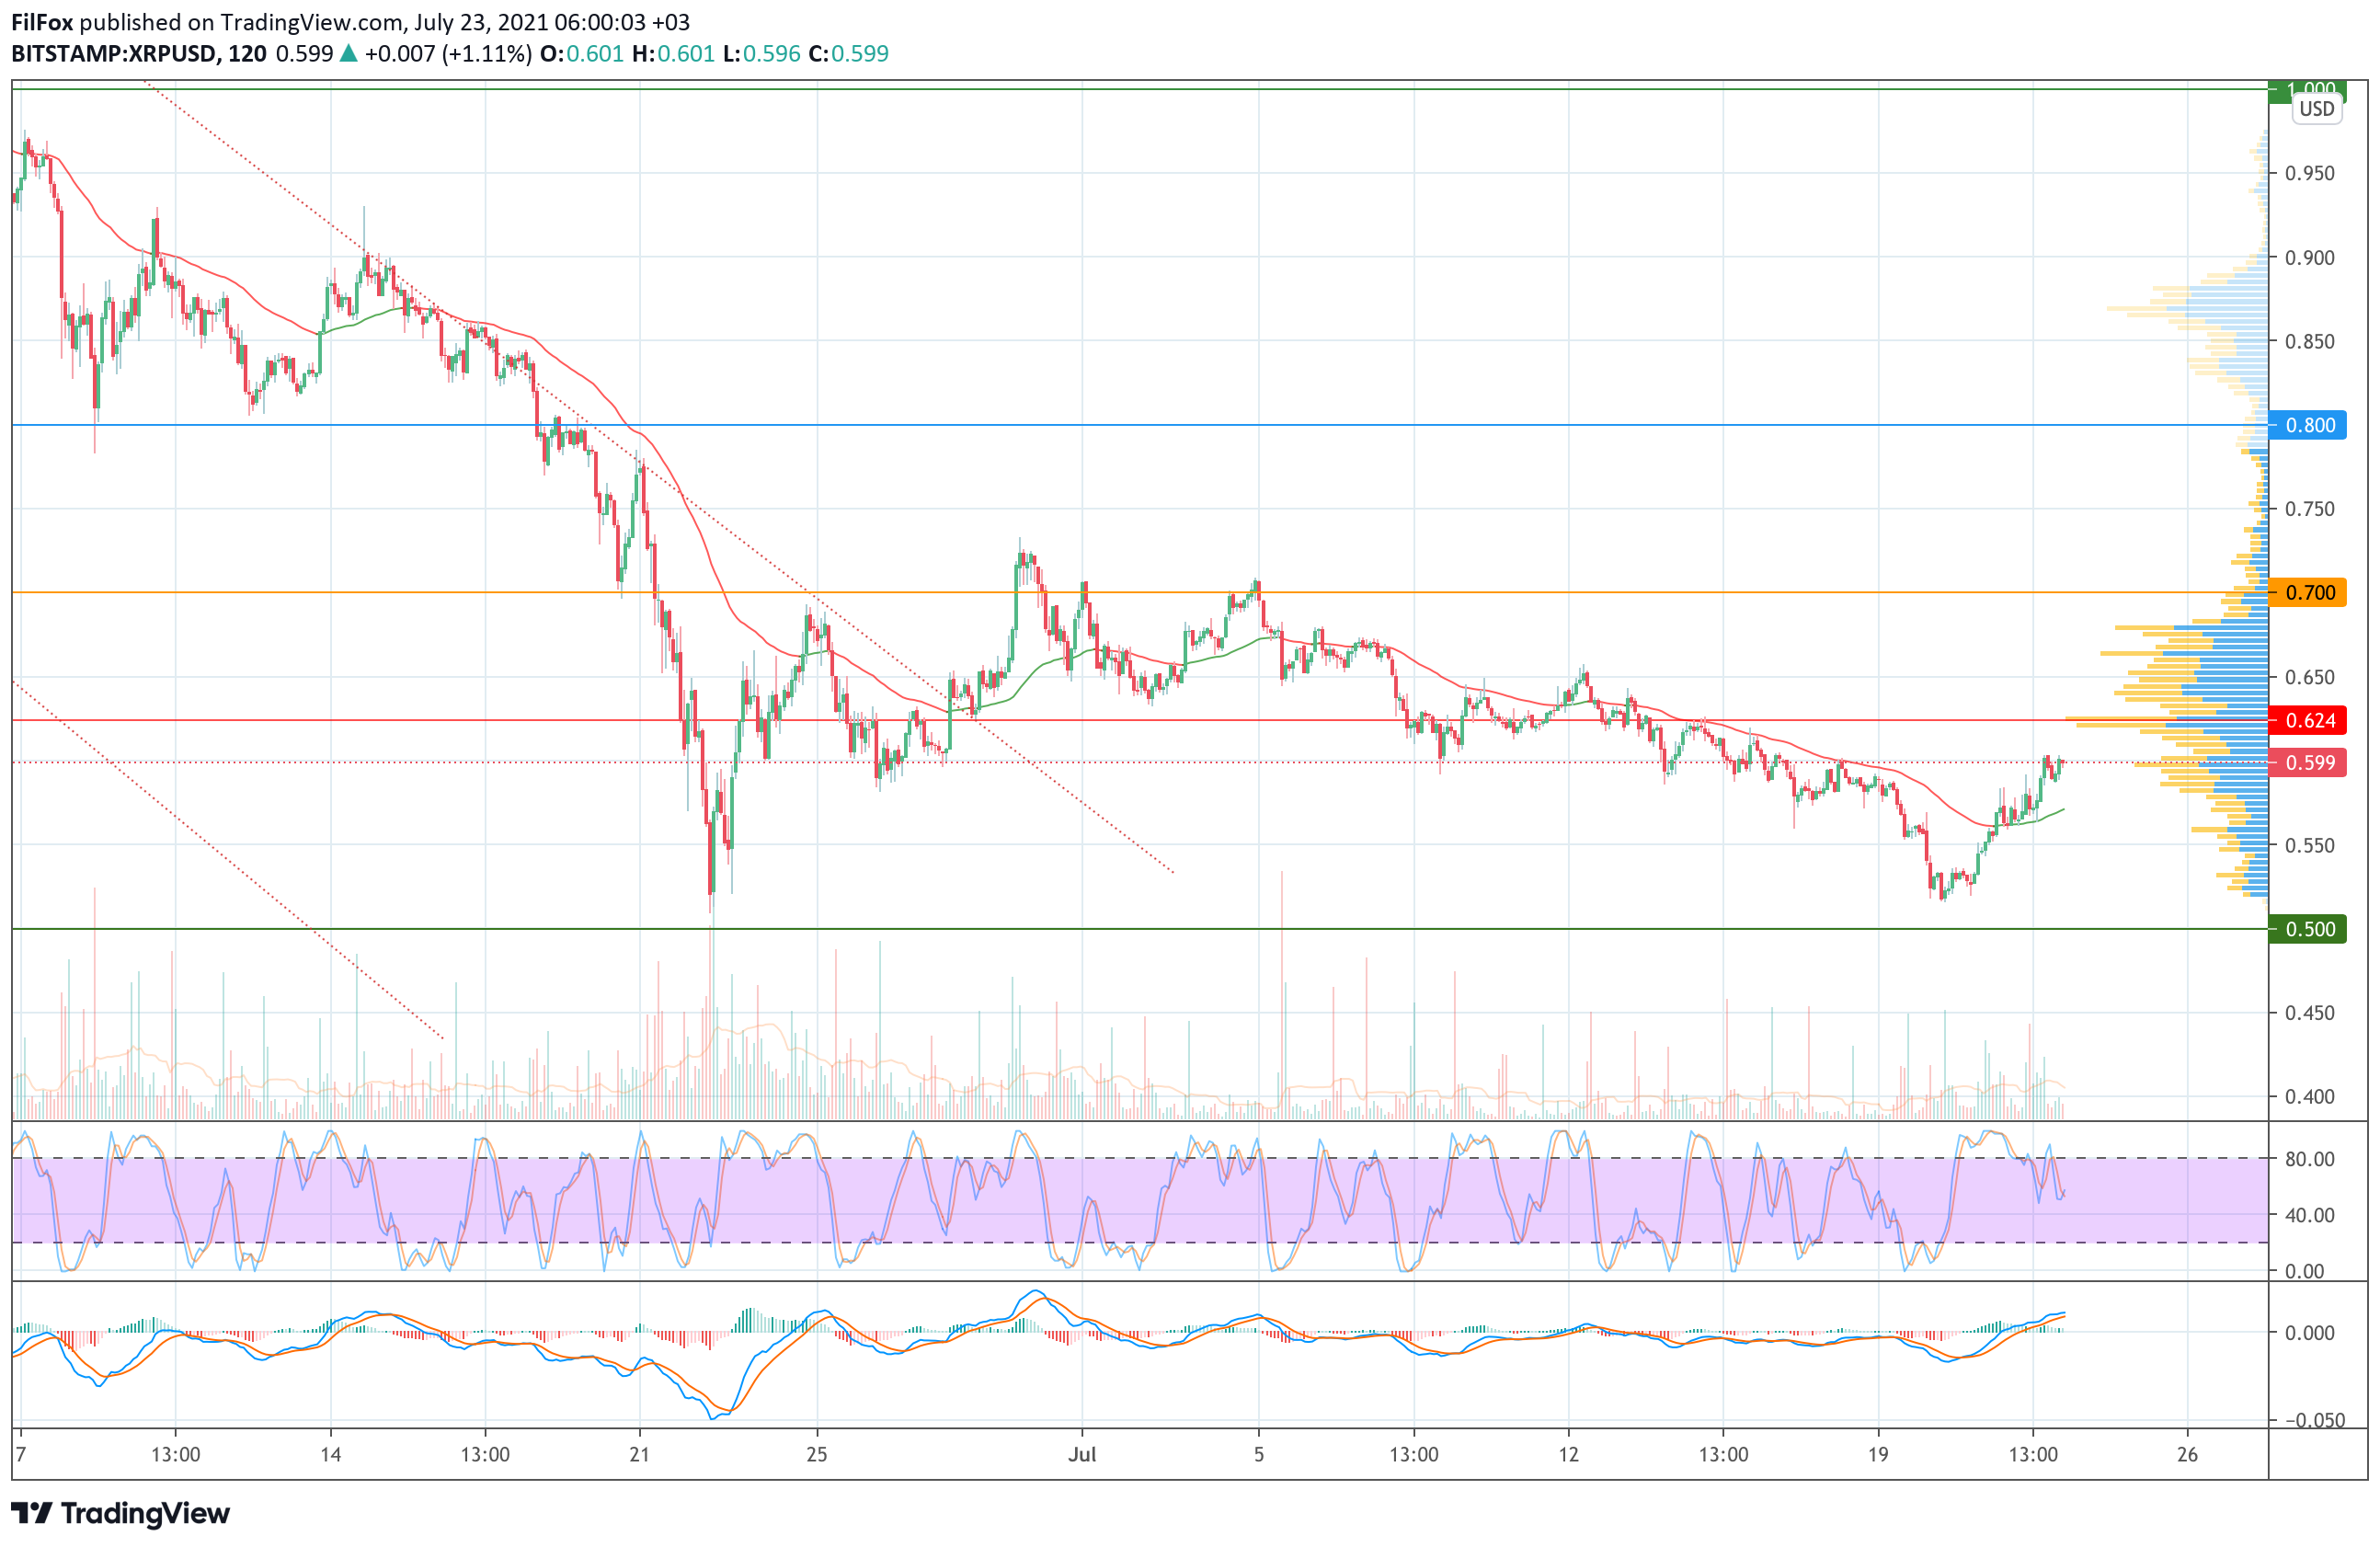 Анализ цен Bitcoin, Ethereum, XRP на 23.07.2021